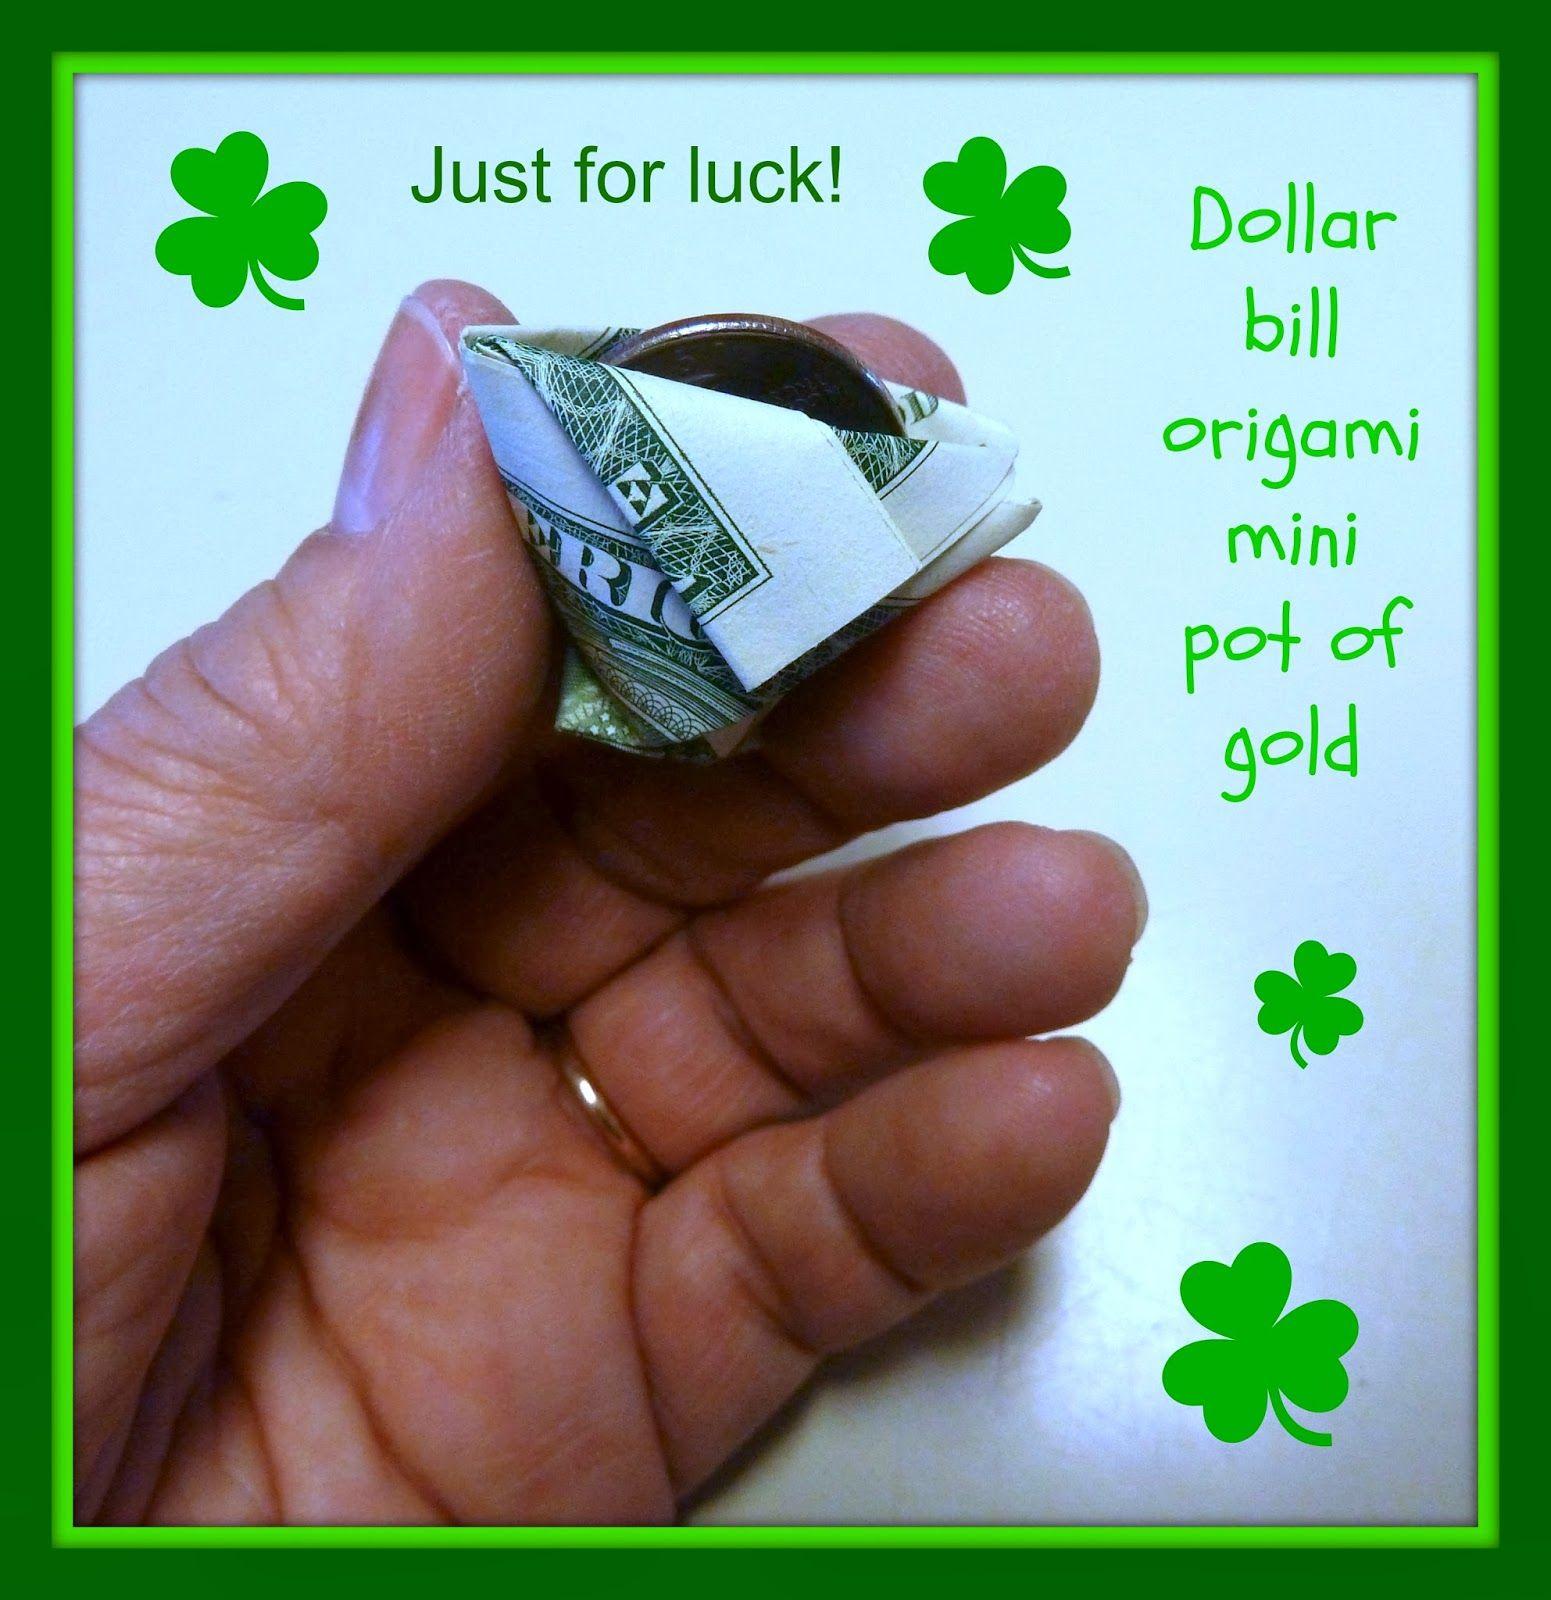 Make it easy crafts dollar bill origami mini pot of gold misc make it easy crafts dollar bill origami mini pot of gold jeuxipadfo Image collections